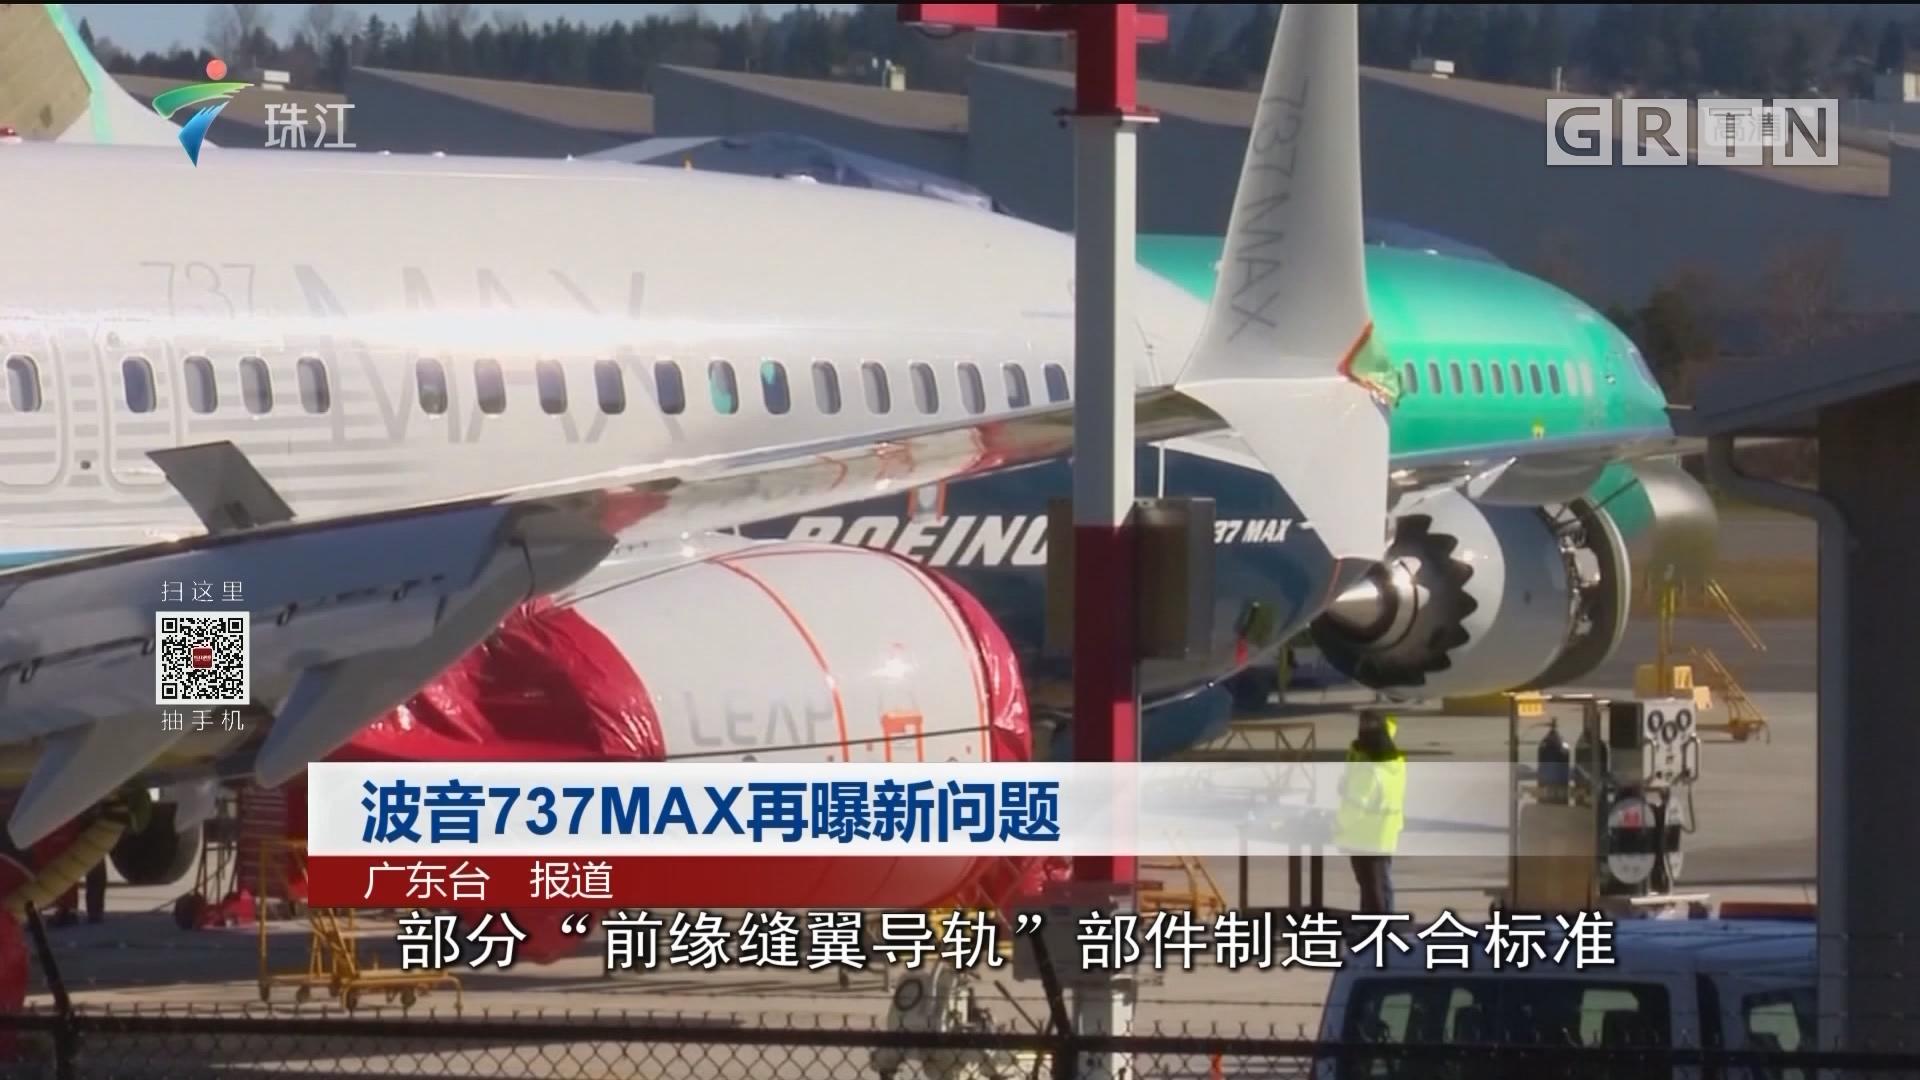 波音737MAX再曝新问题